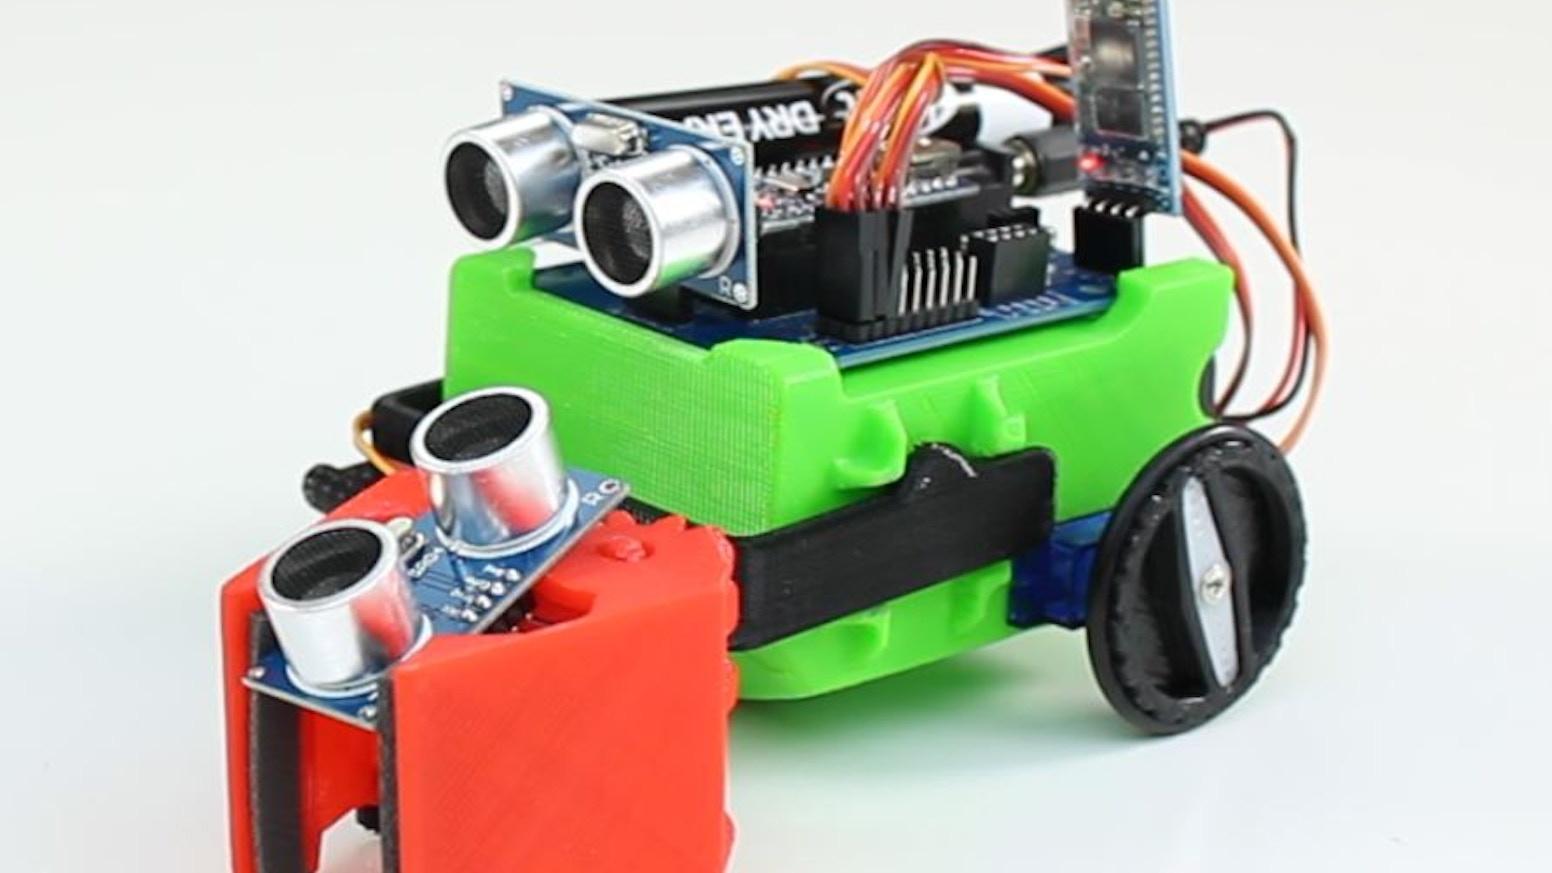 littlebot budget robotics kit for beginners and stem by slant